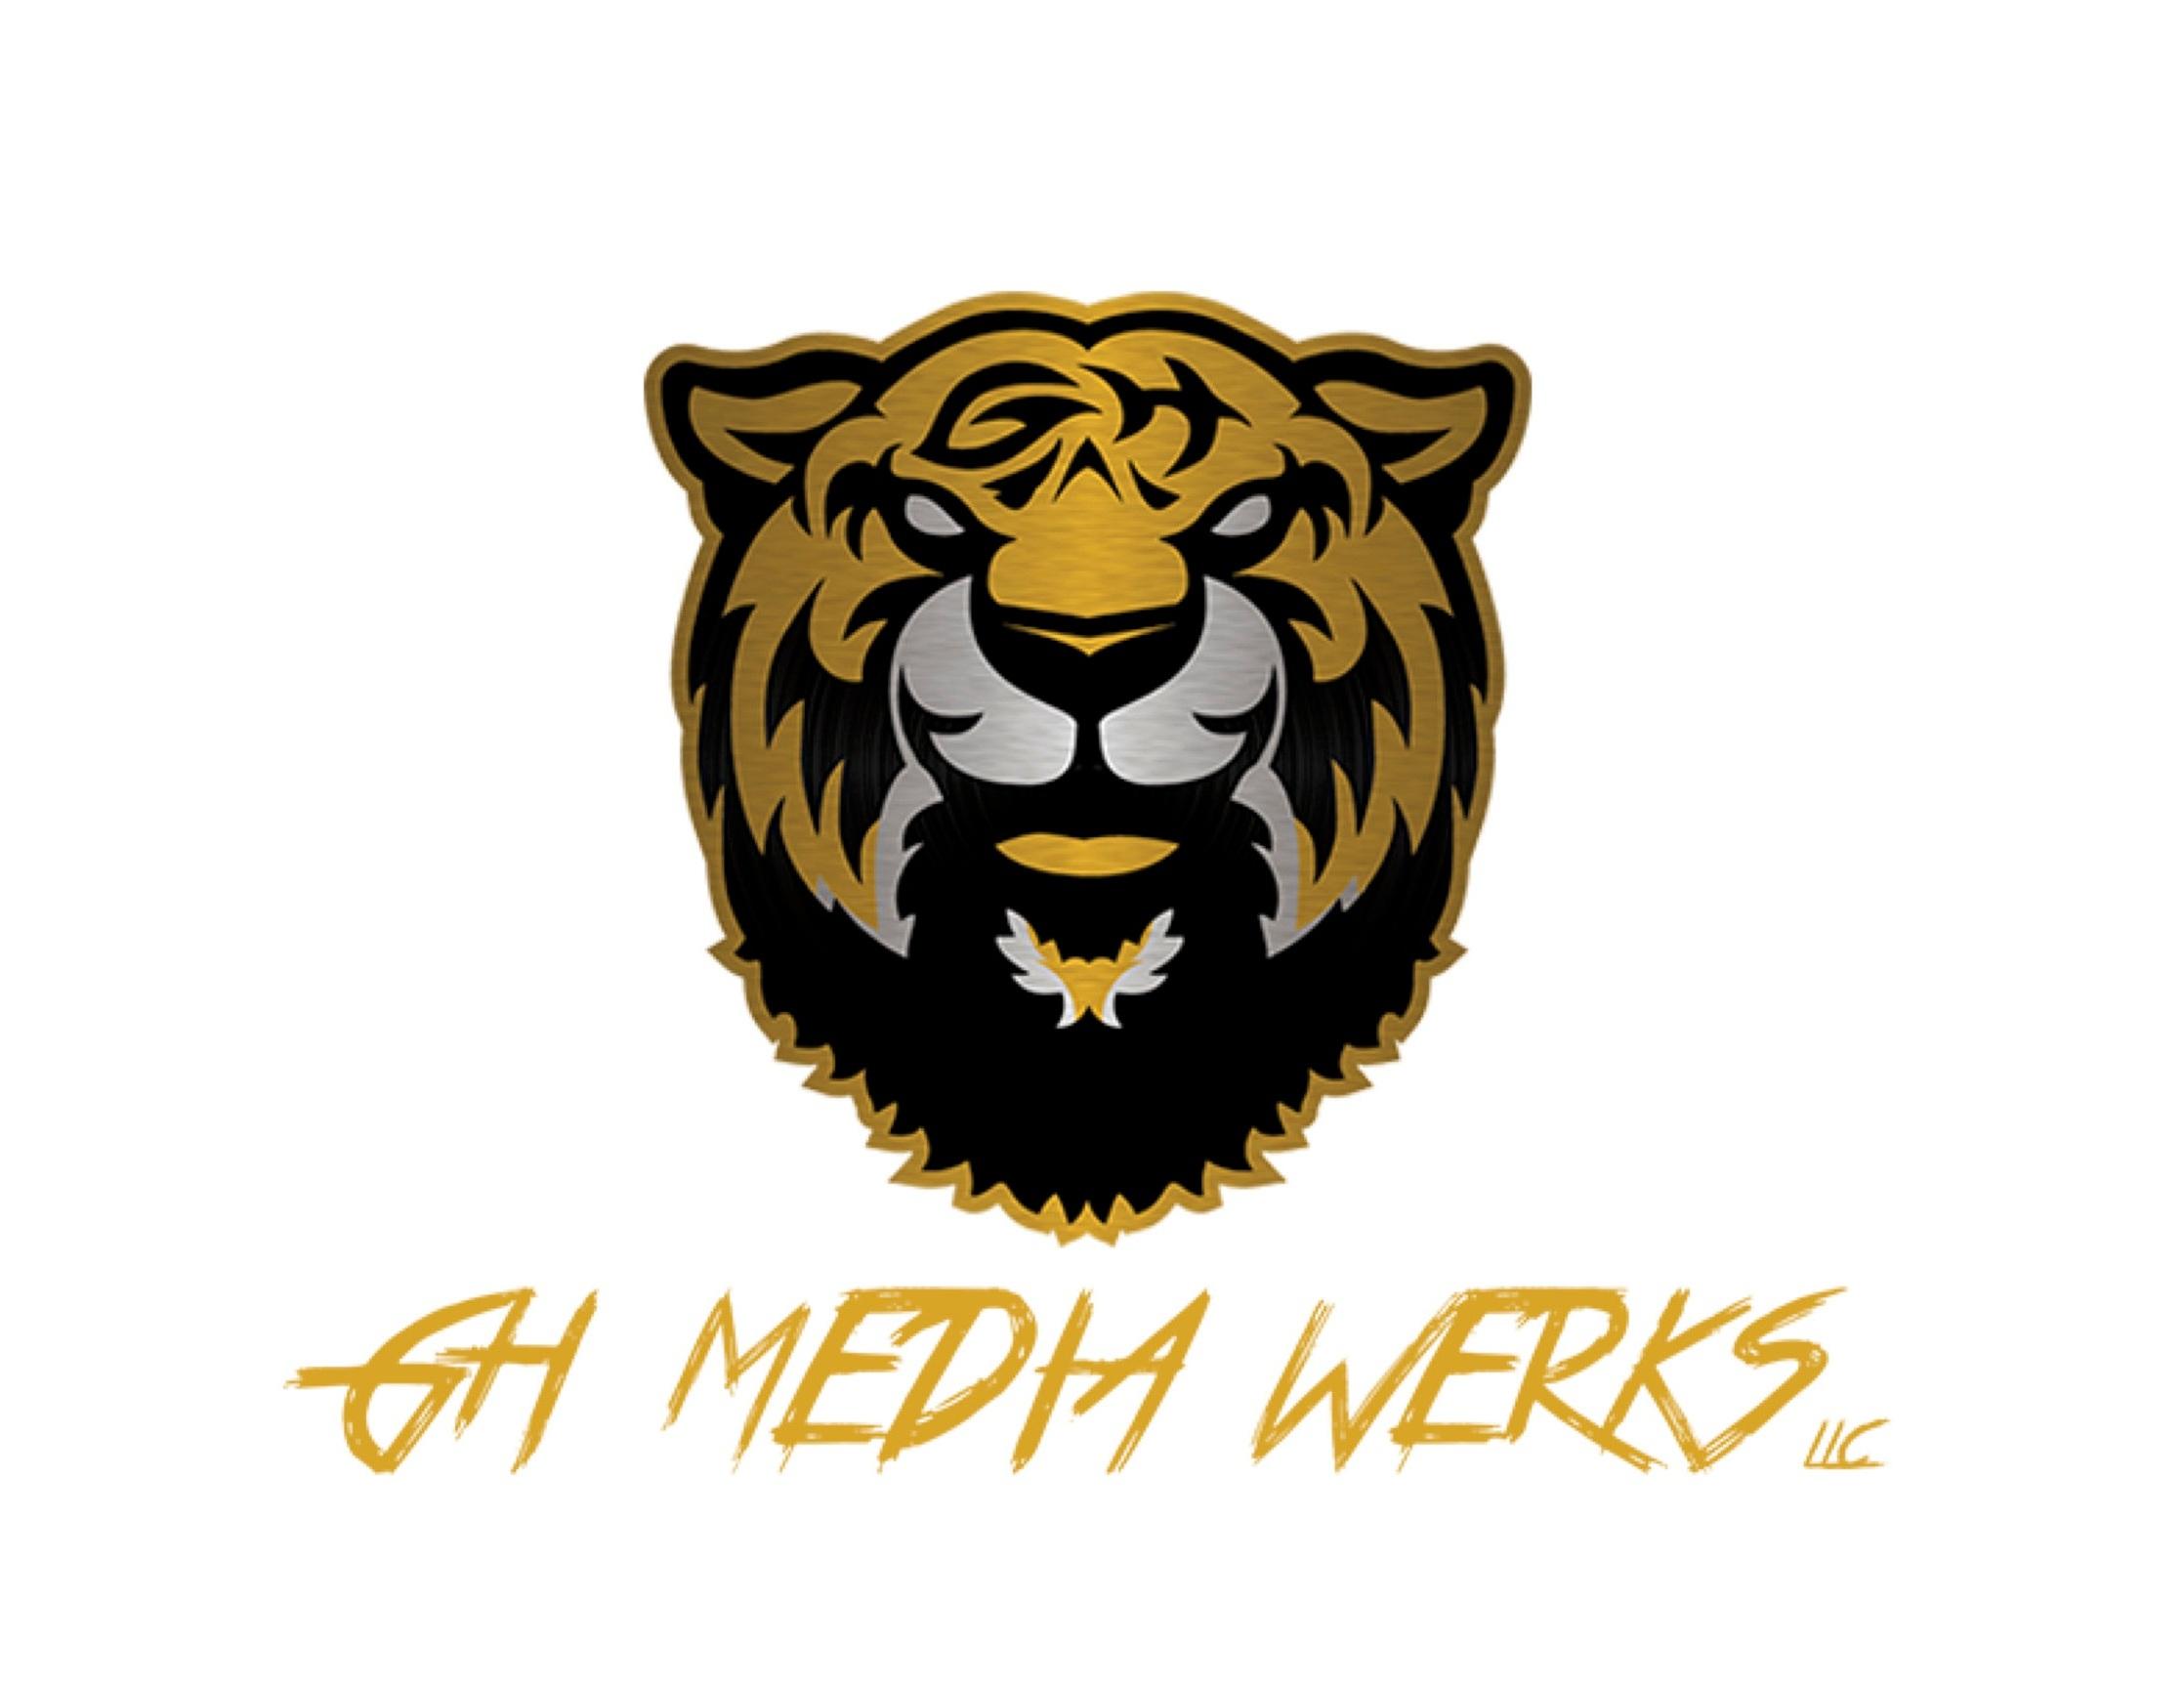 GH Media Werks